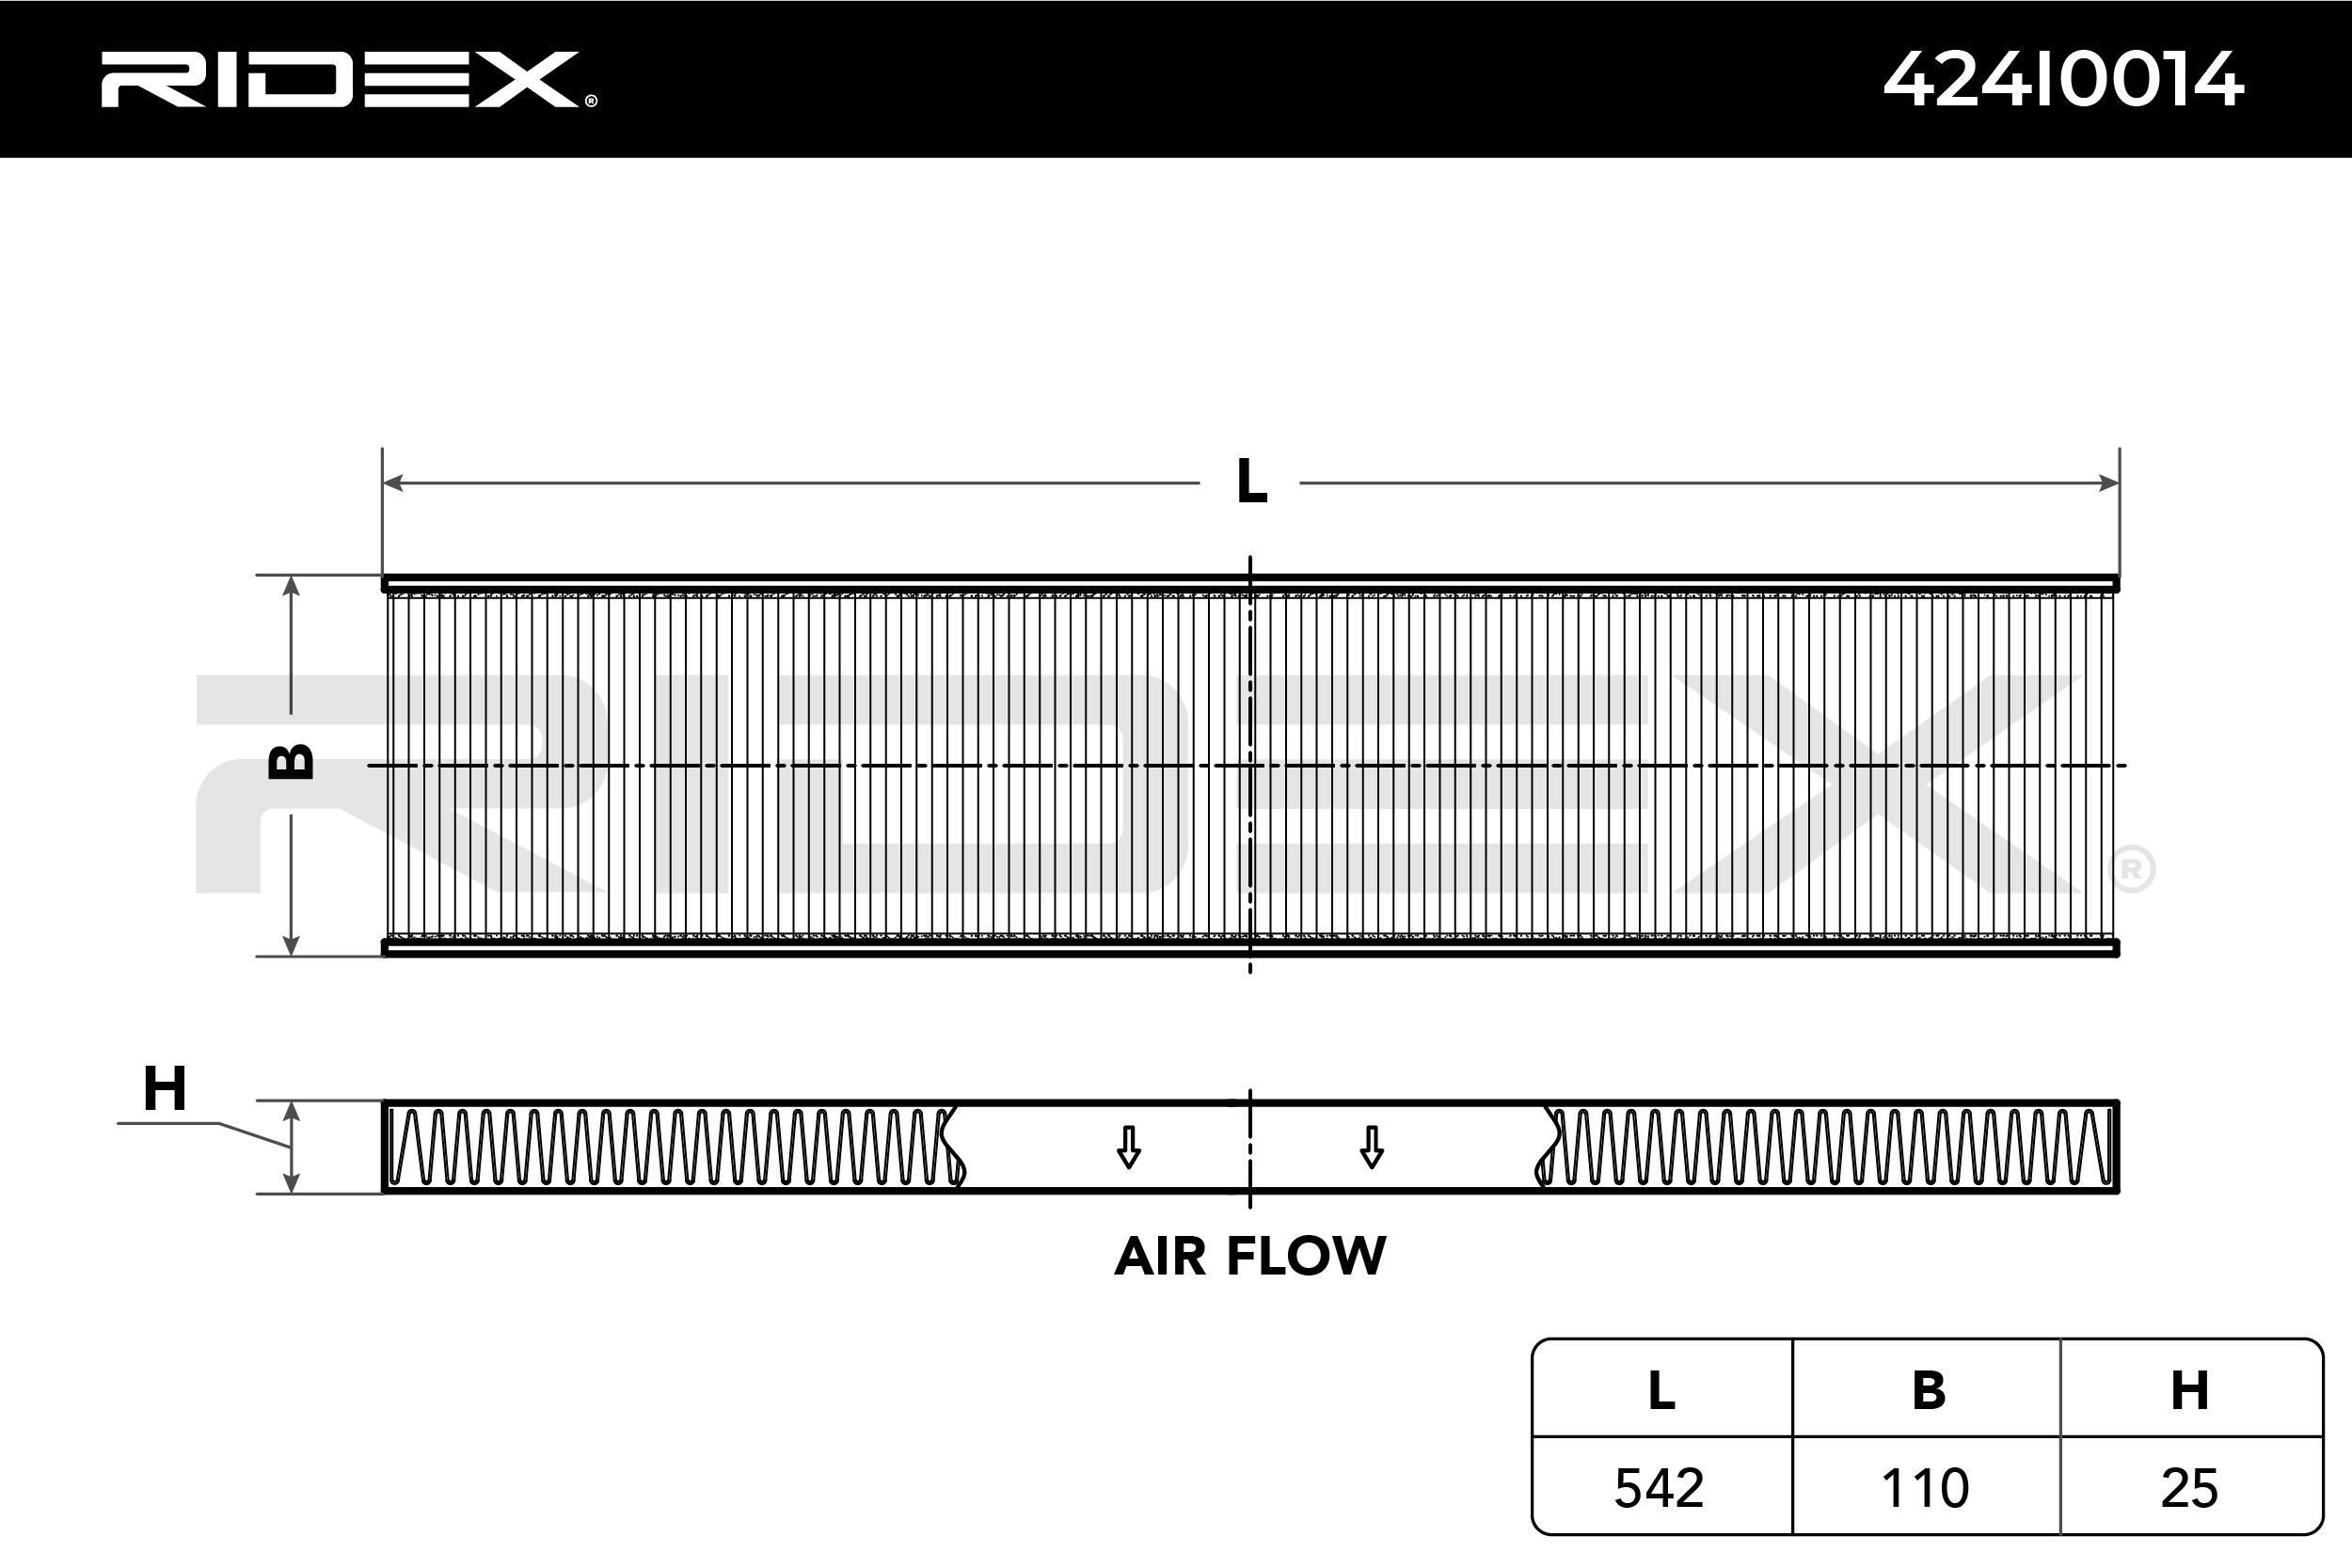 Staubfilter RIDEX 424I0014 Erfahrung